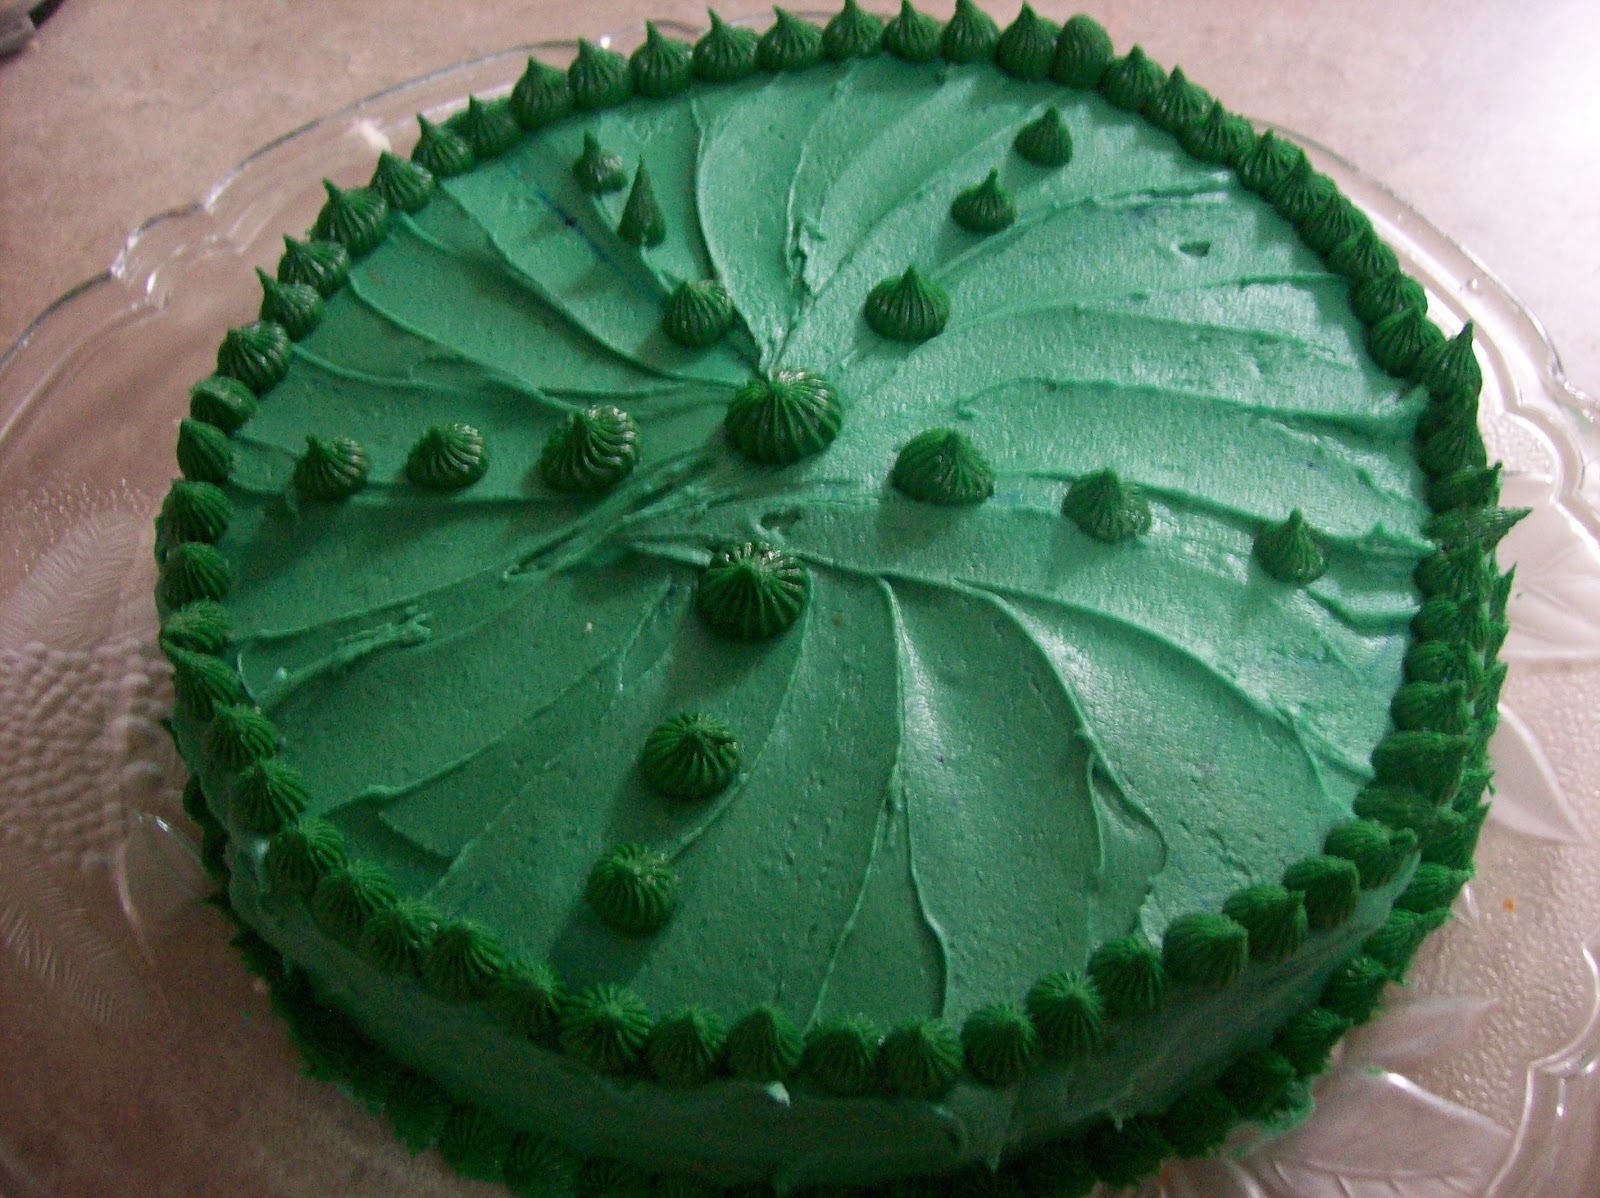 Birthday cake for Jesus, made by April Garwood of Banana Moon Studio